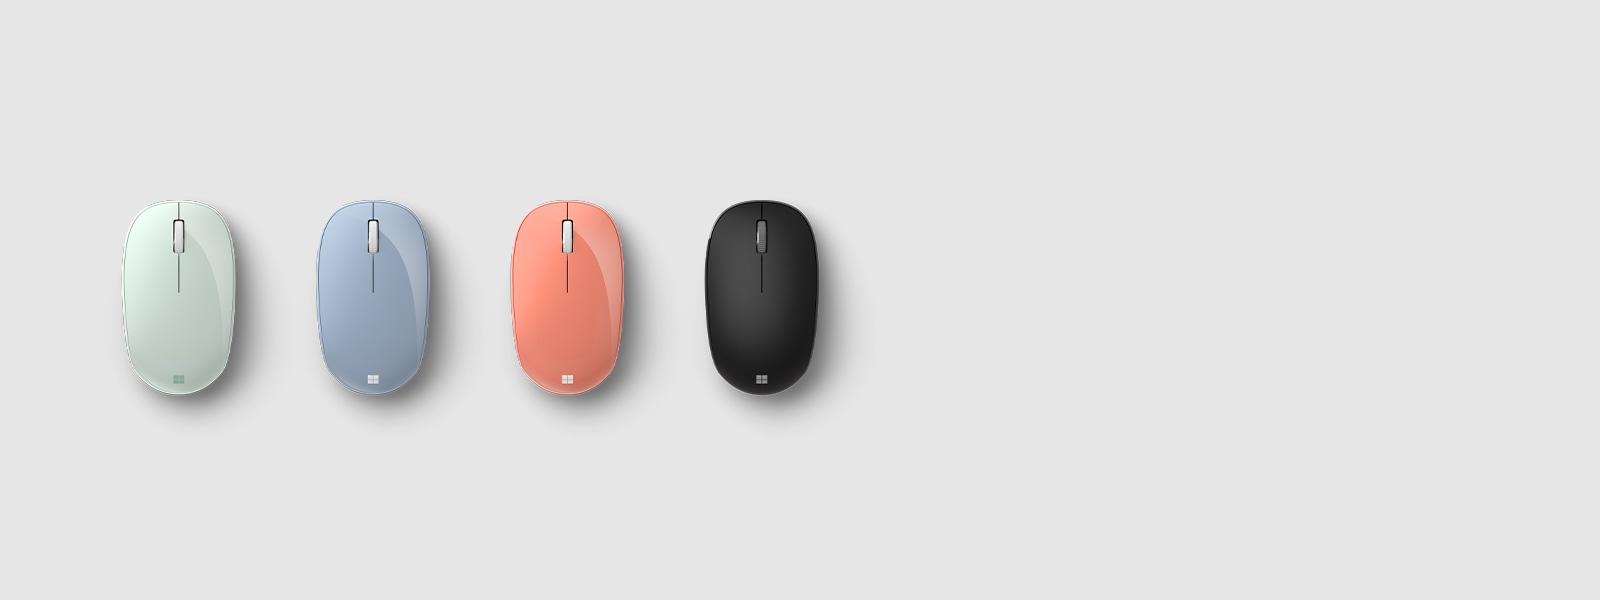 Bluetooth-мышь Microsoft в разных цветах